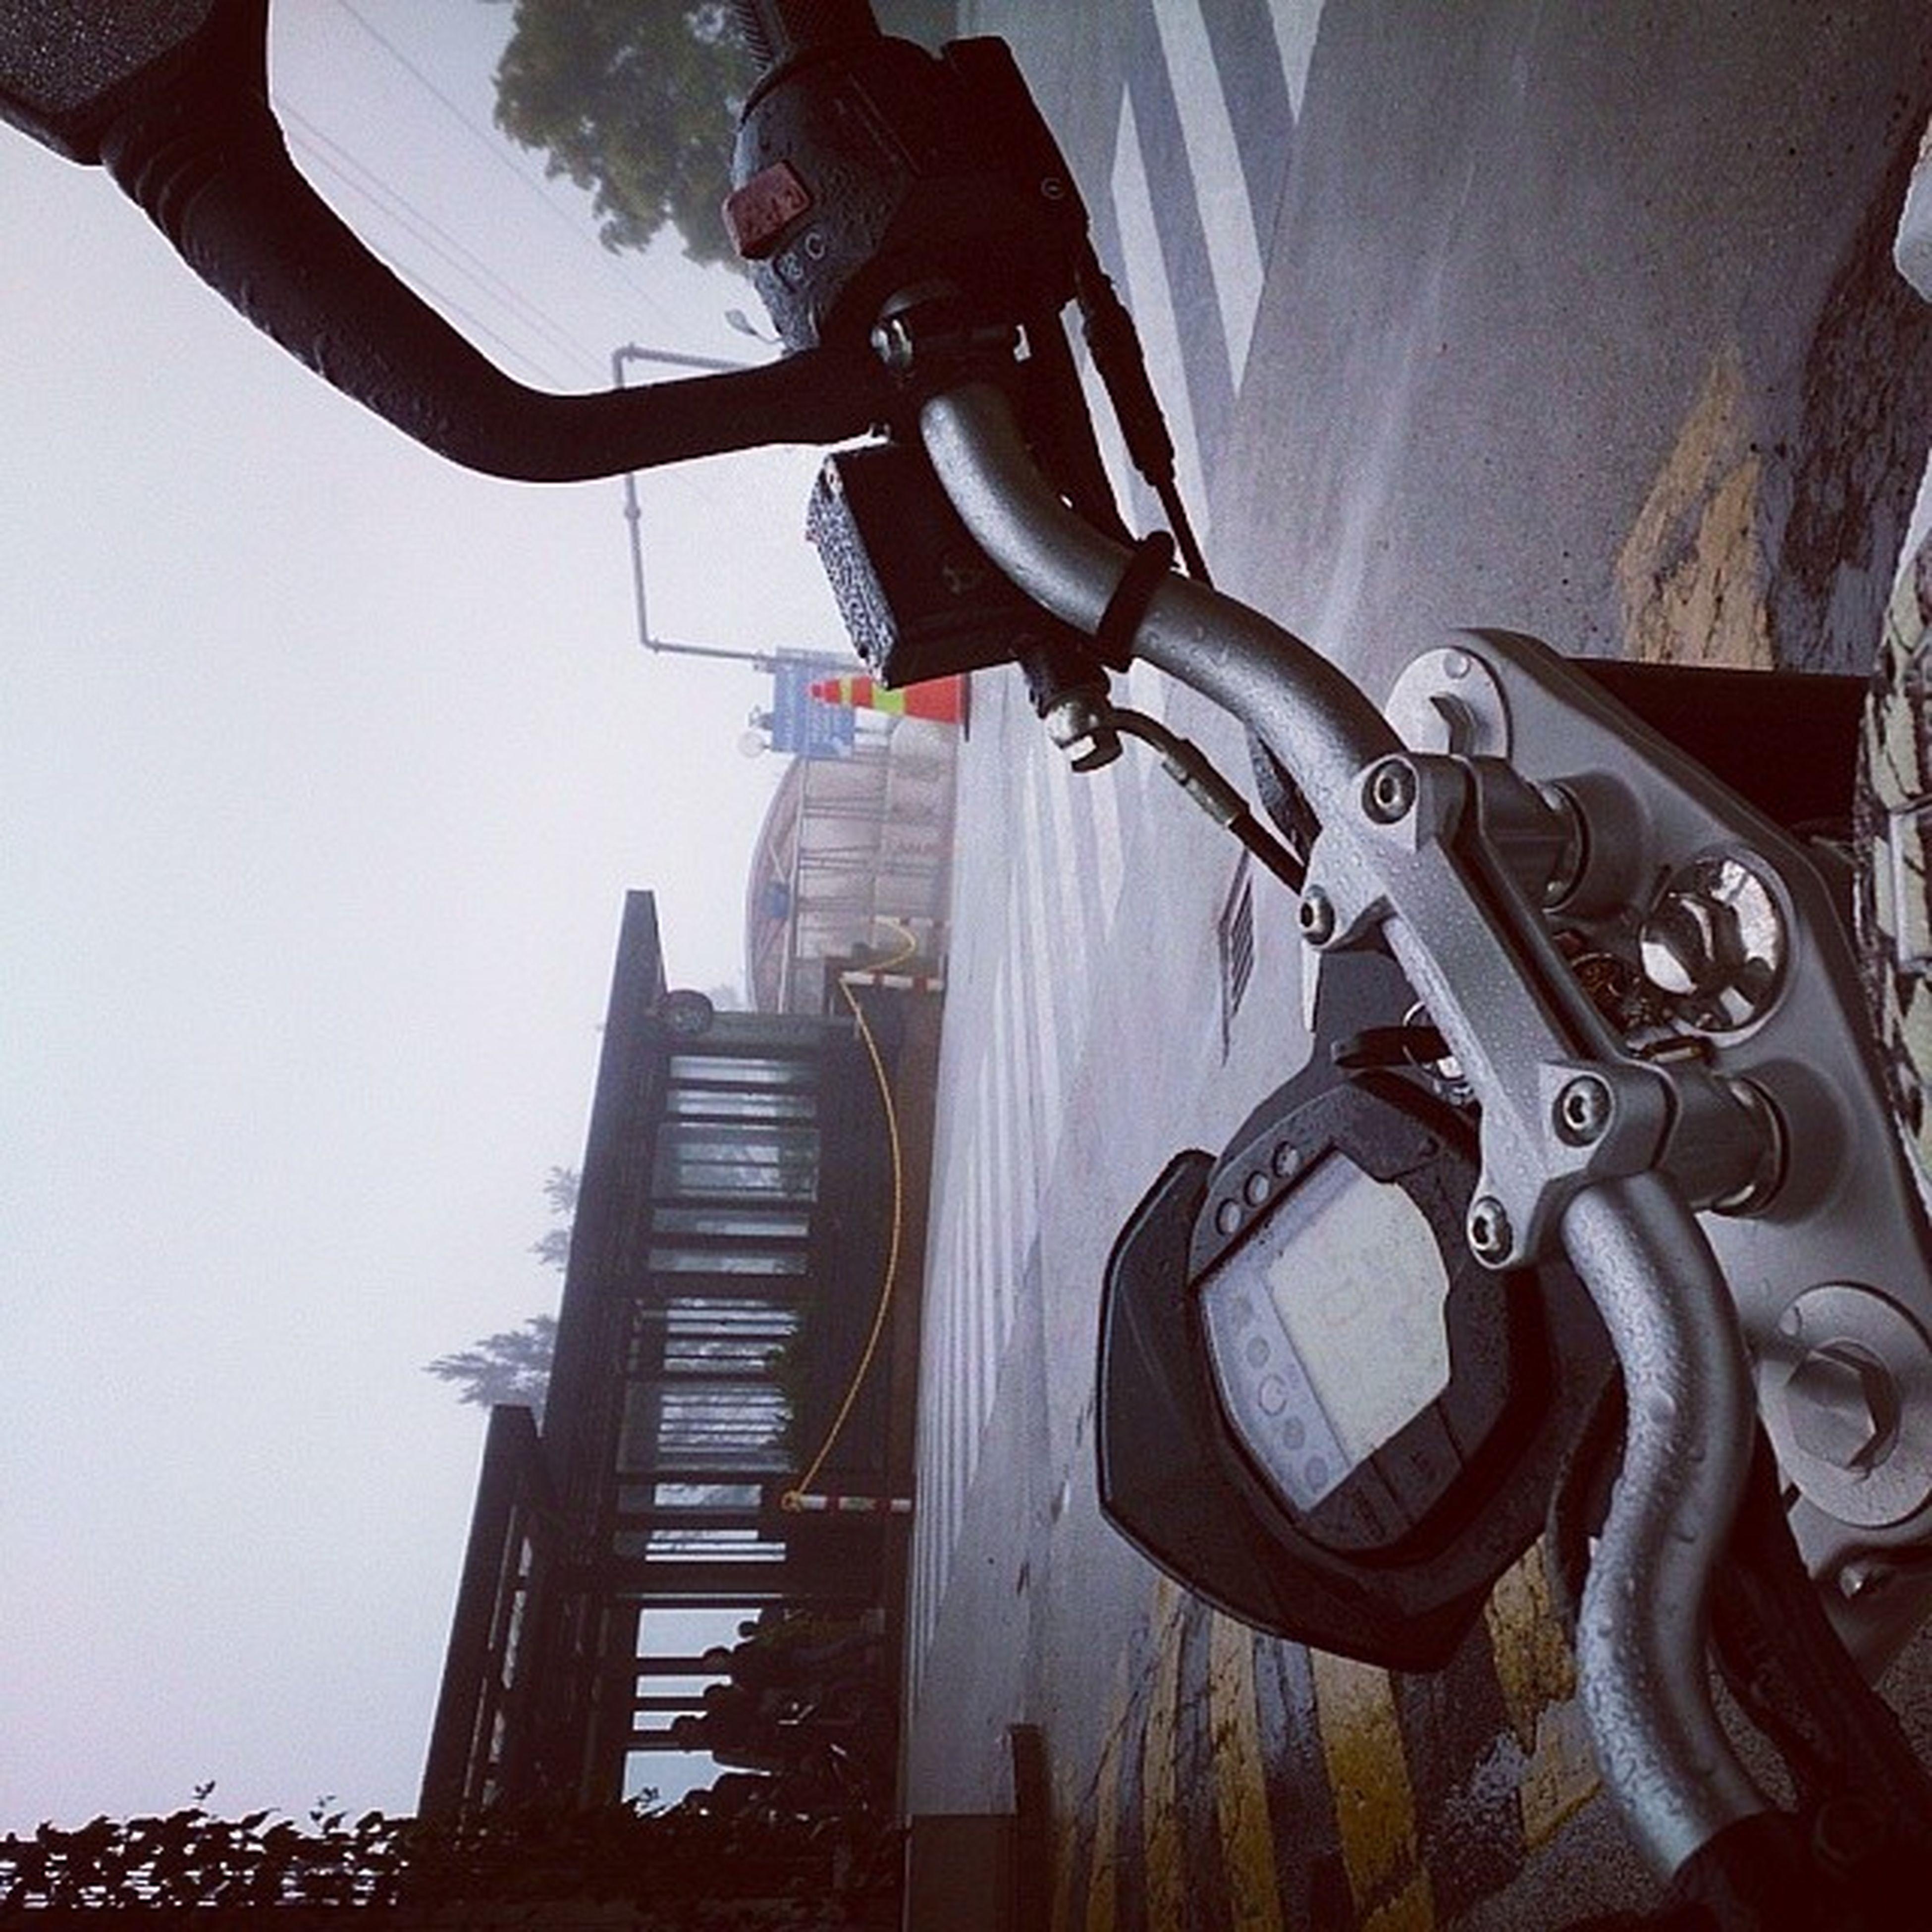 Ride to genting @ikmalmahadzer @fizadolphin Sejukbeku  hujan Asahtayarconner2